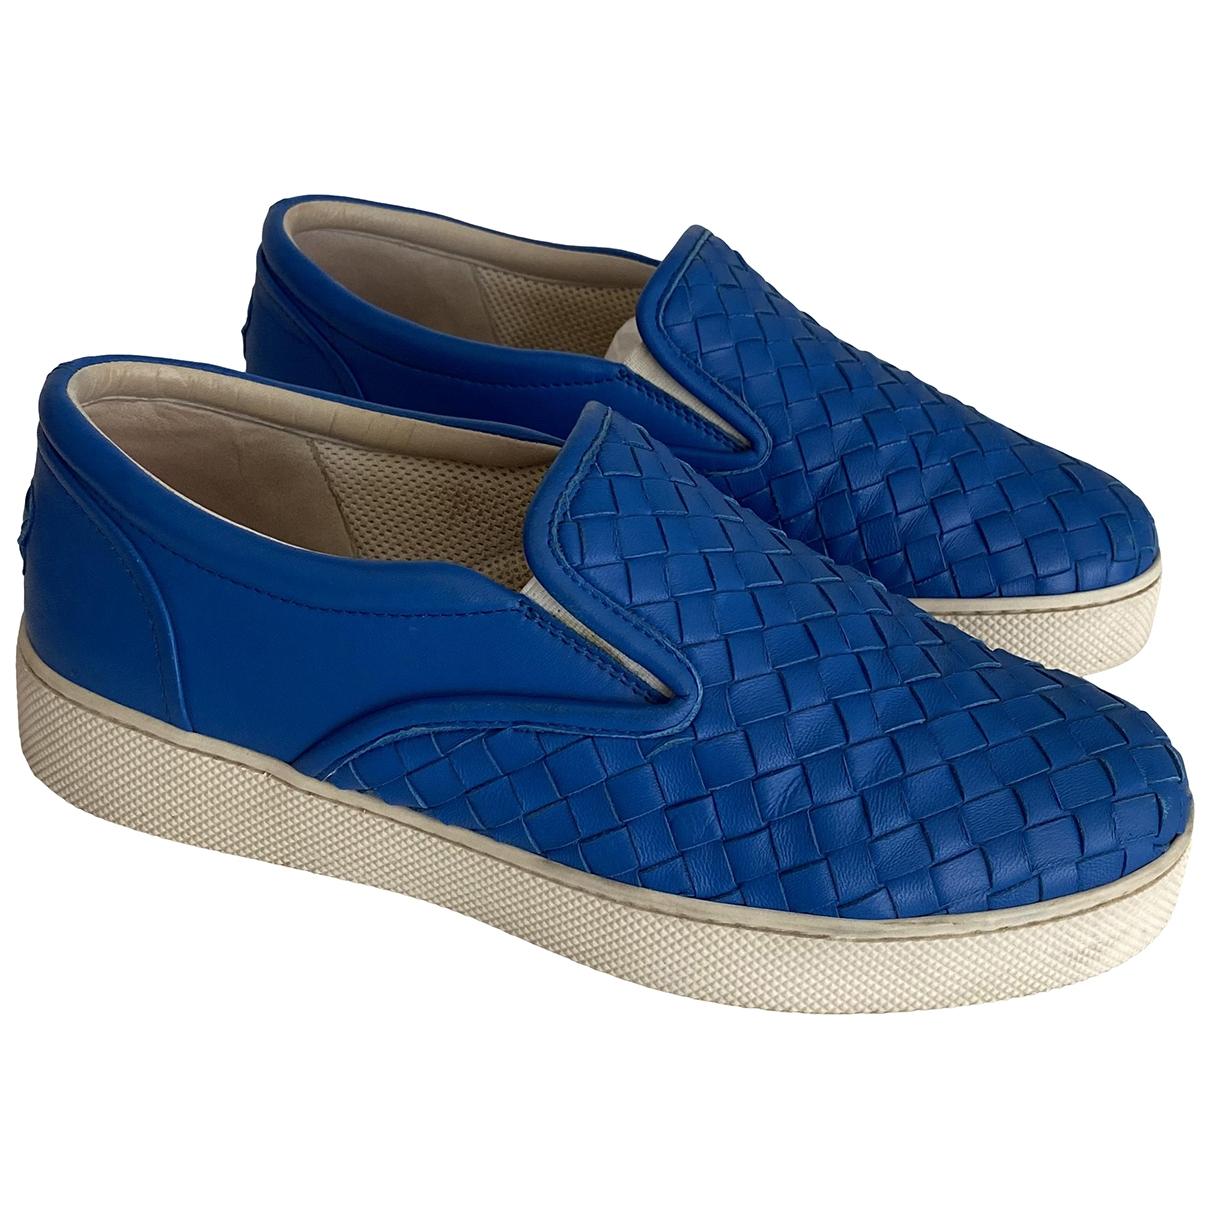 Bottega Veneta - Baskets   pour femme en cuir - bleu